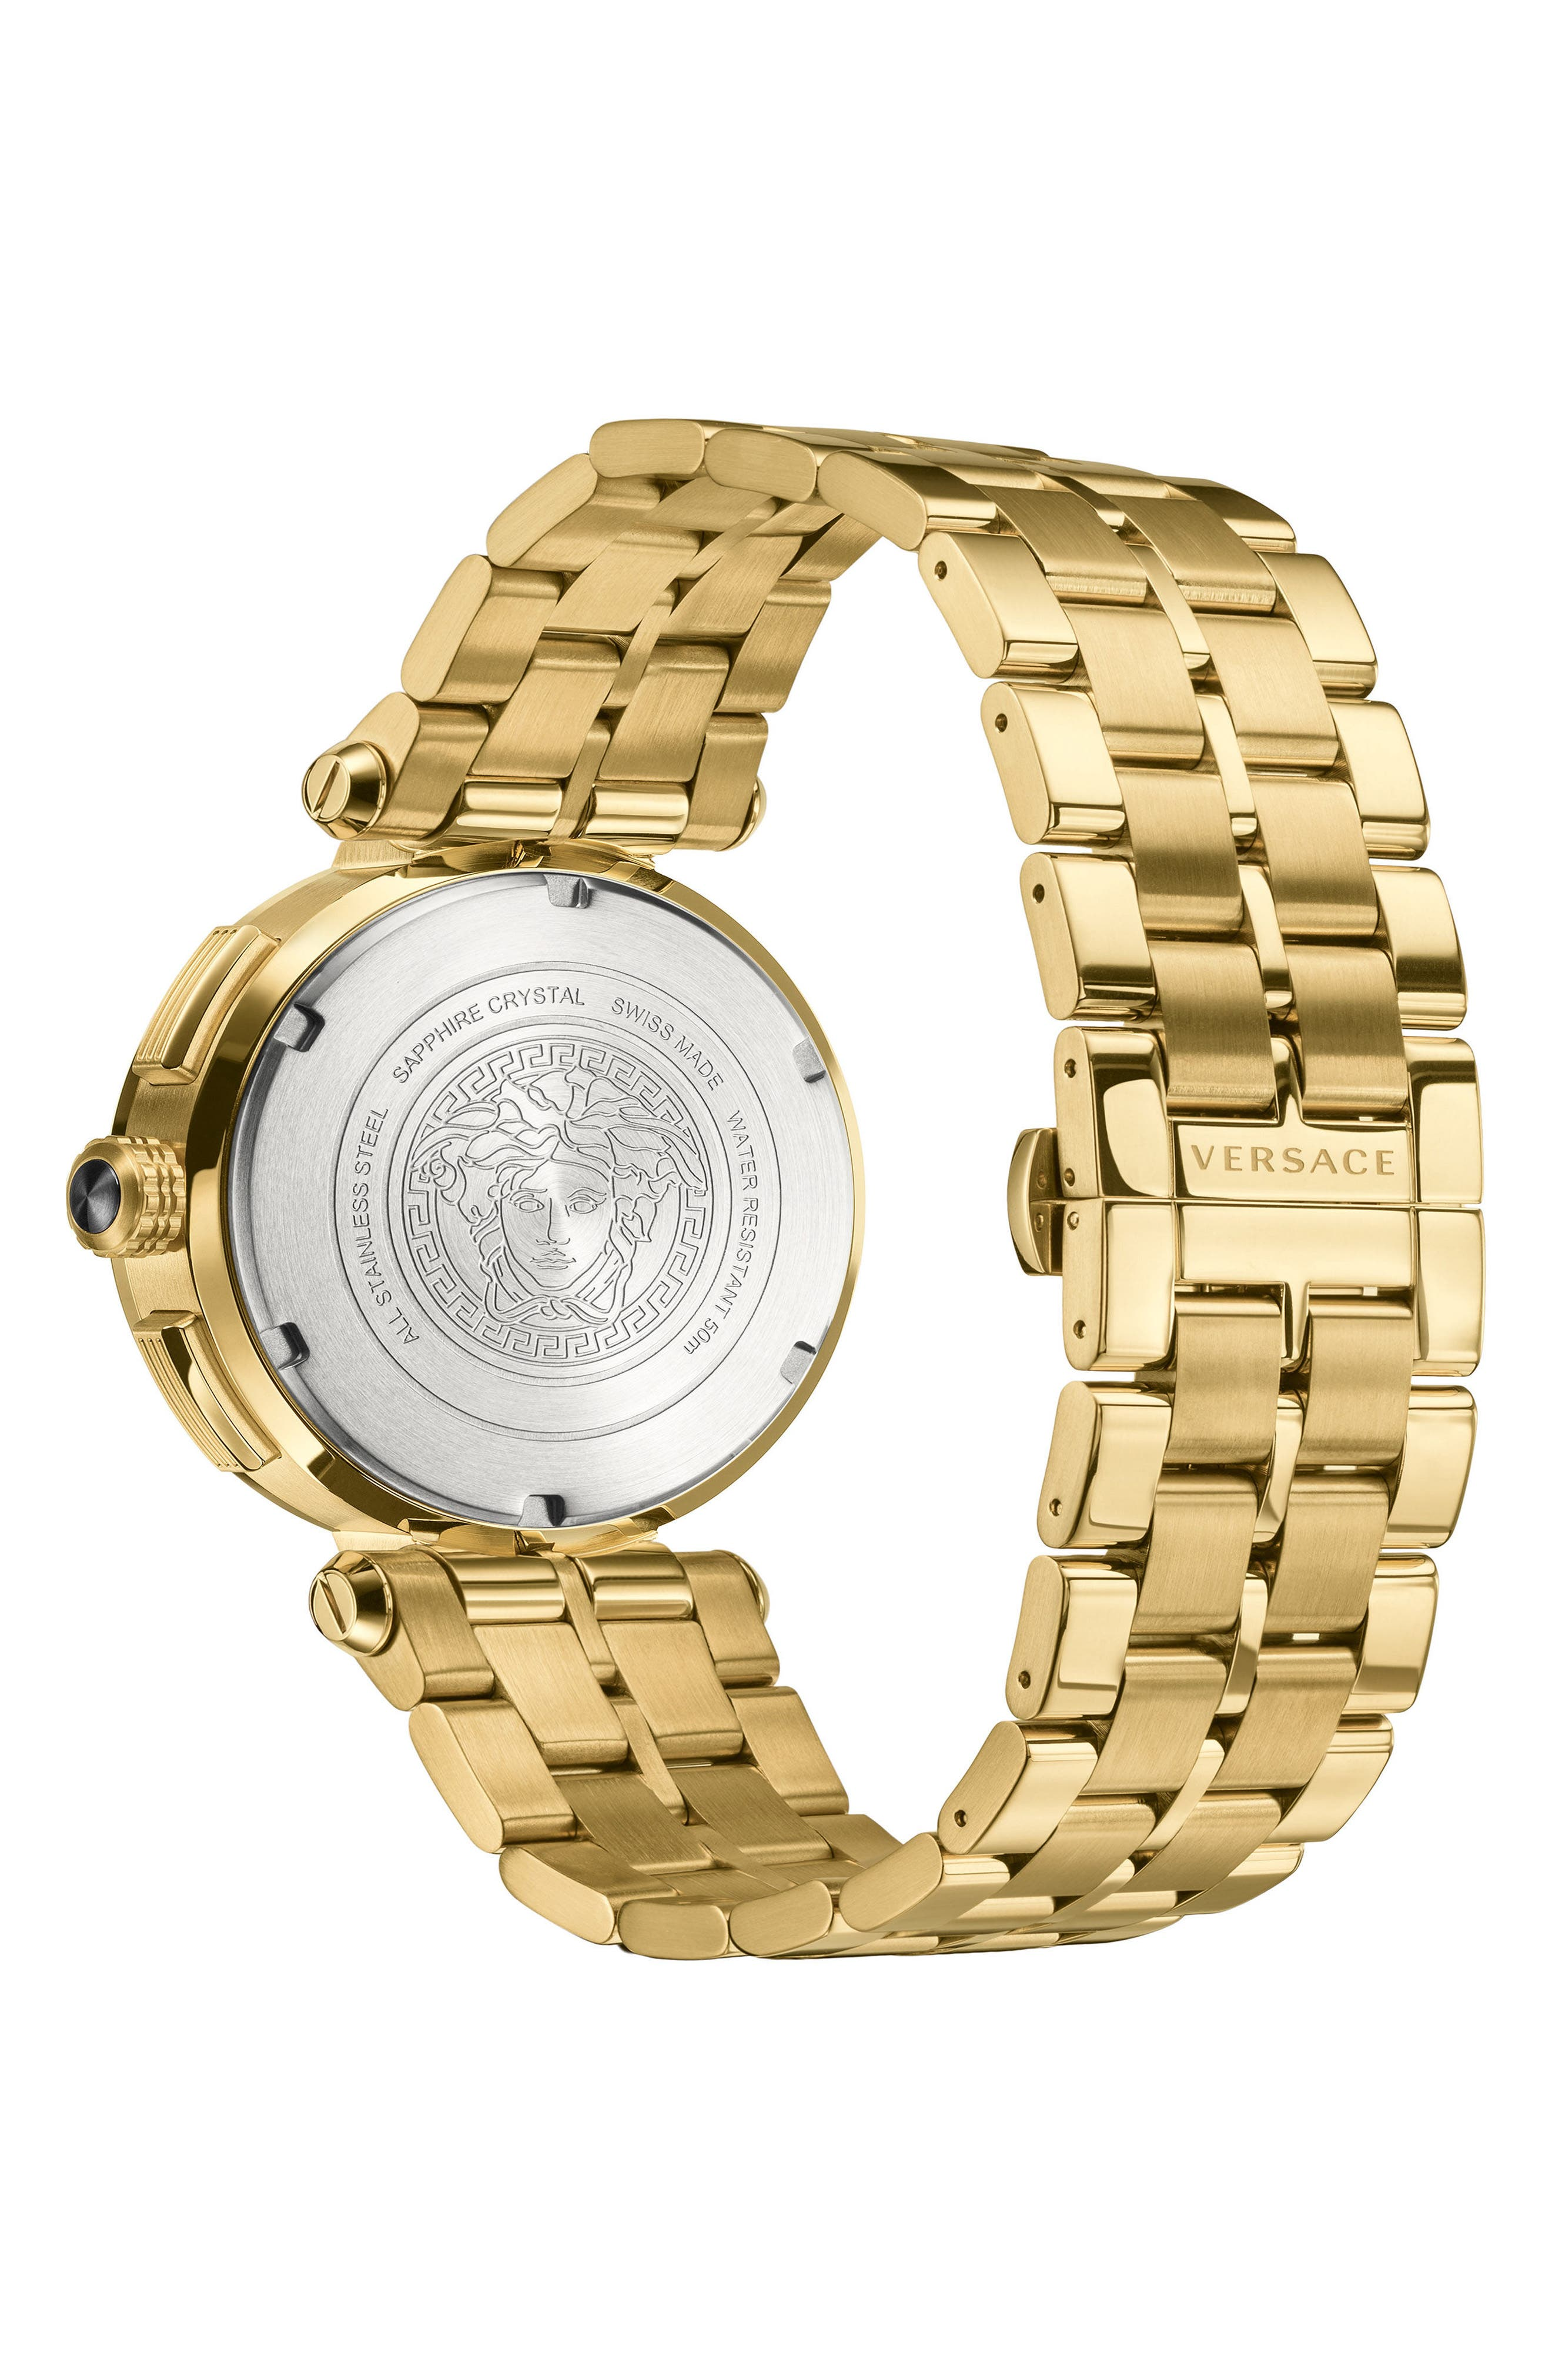 VERSACE, Aion Chronograph Bracelet Watch, 45mm, Alternate thumbnail 2, color, GOLD/ SILVER